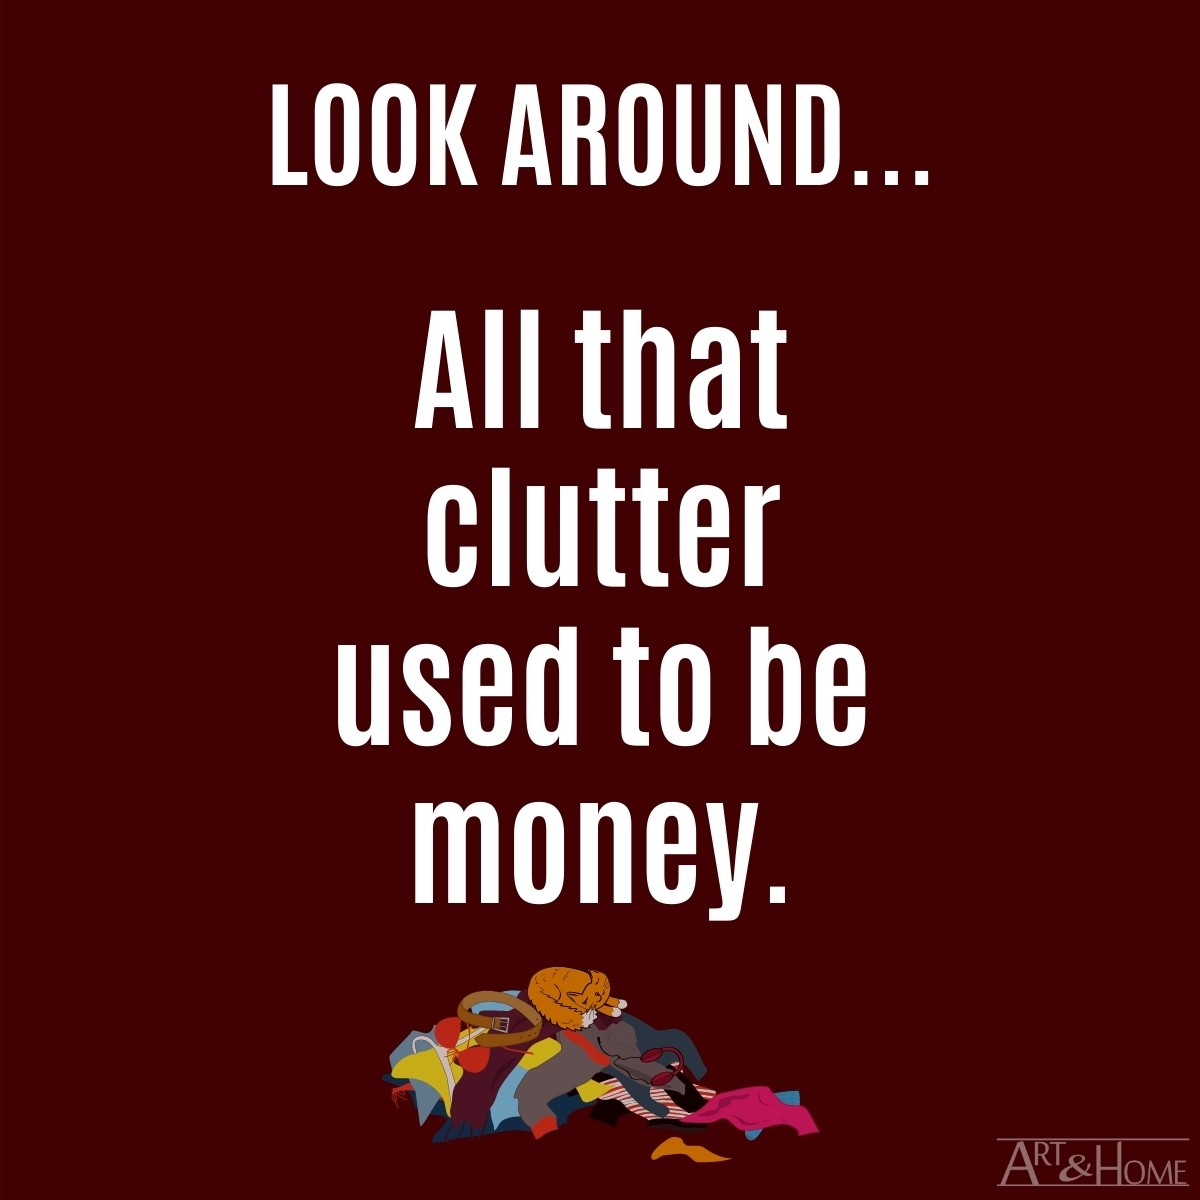 MEME about clutter